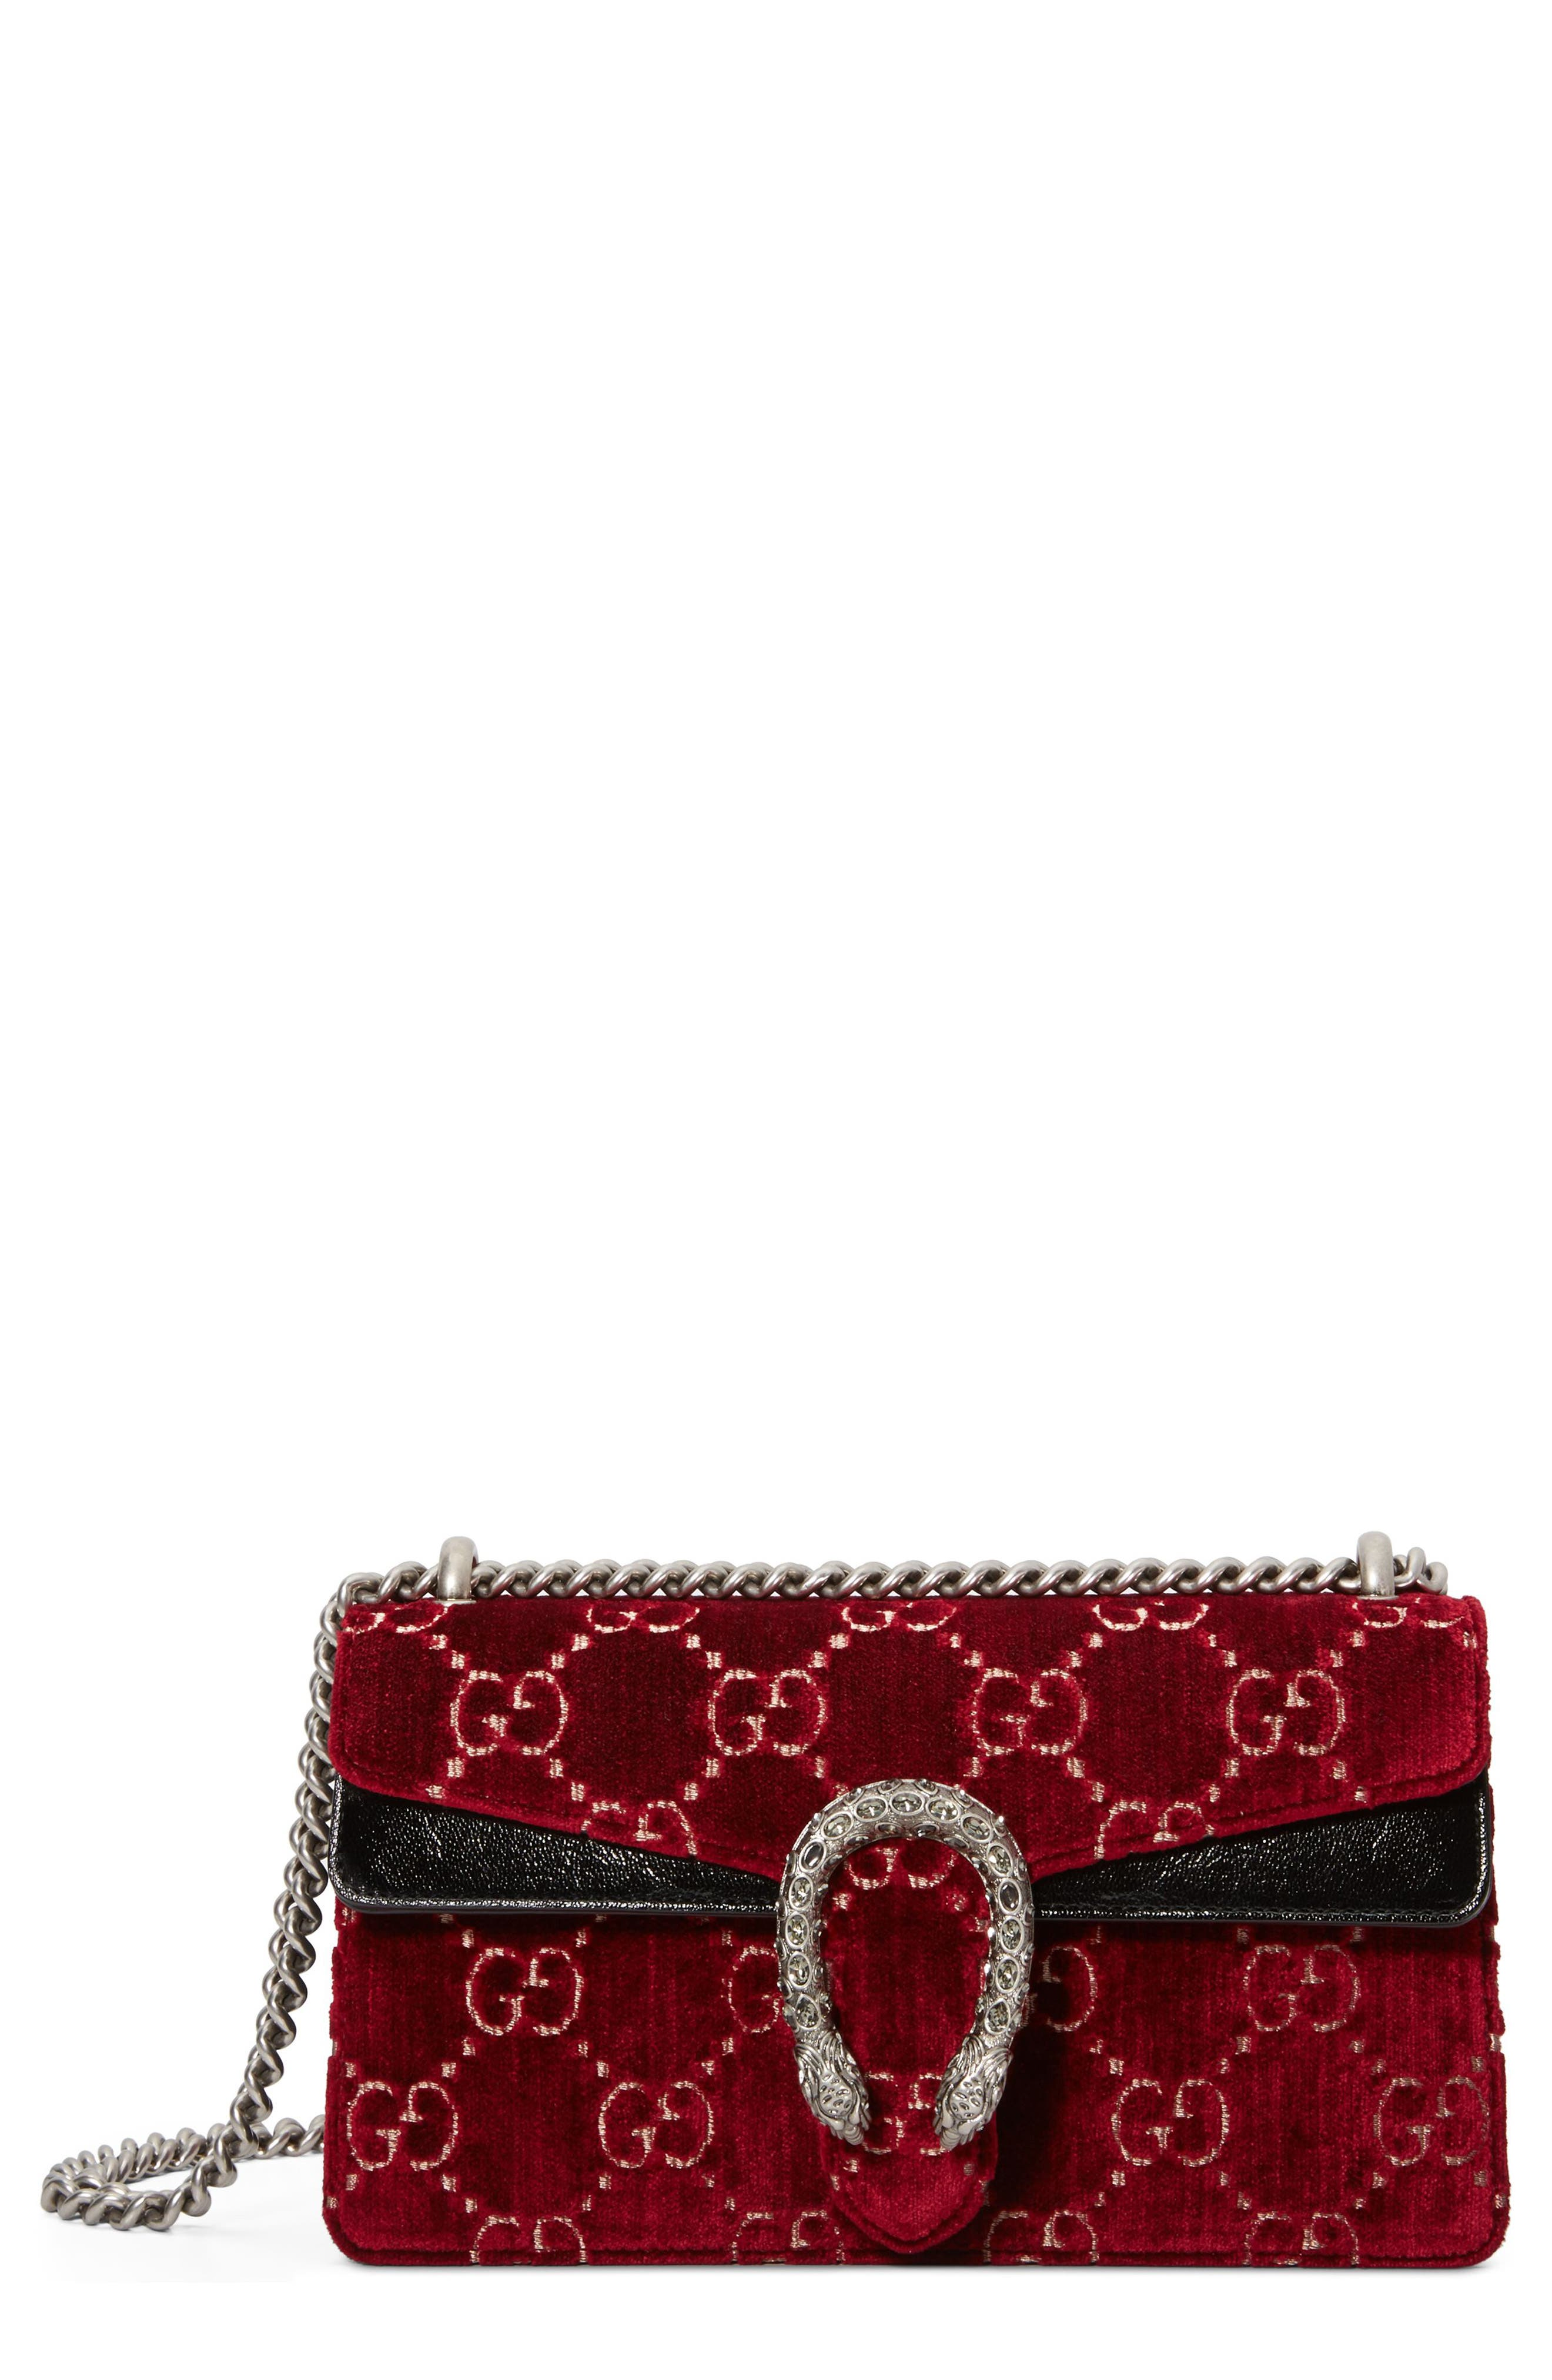 Small Dionysus GG Velvet Shoulder Bag,                         Main,                         color, Red Cipria/ Black Diamond